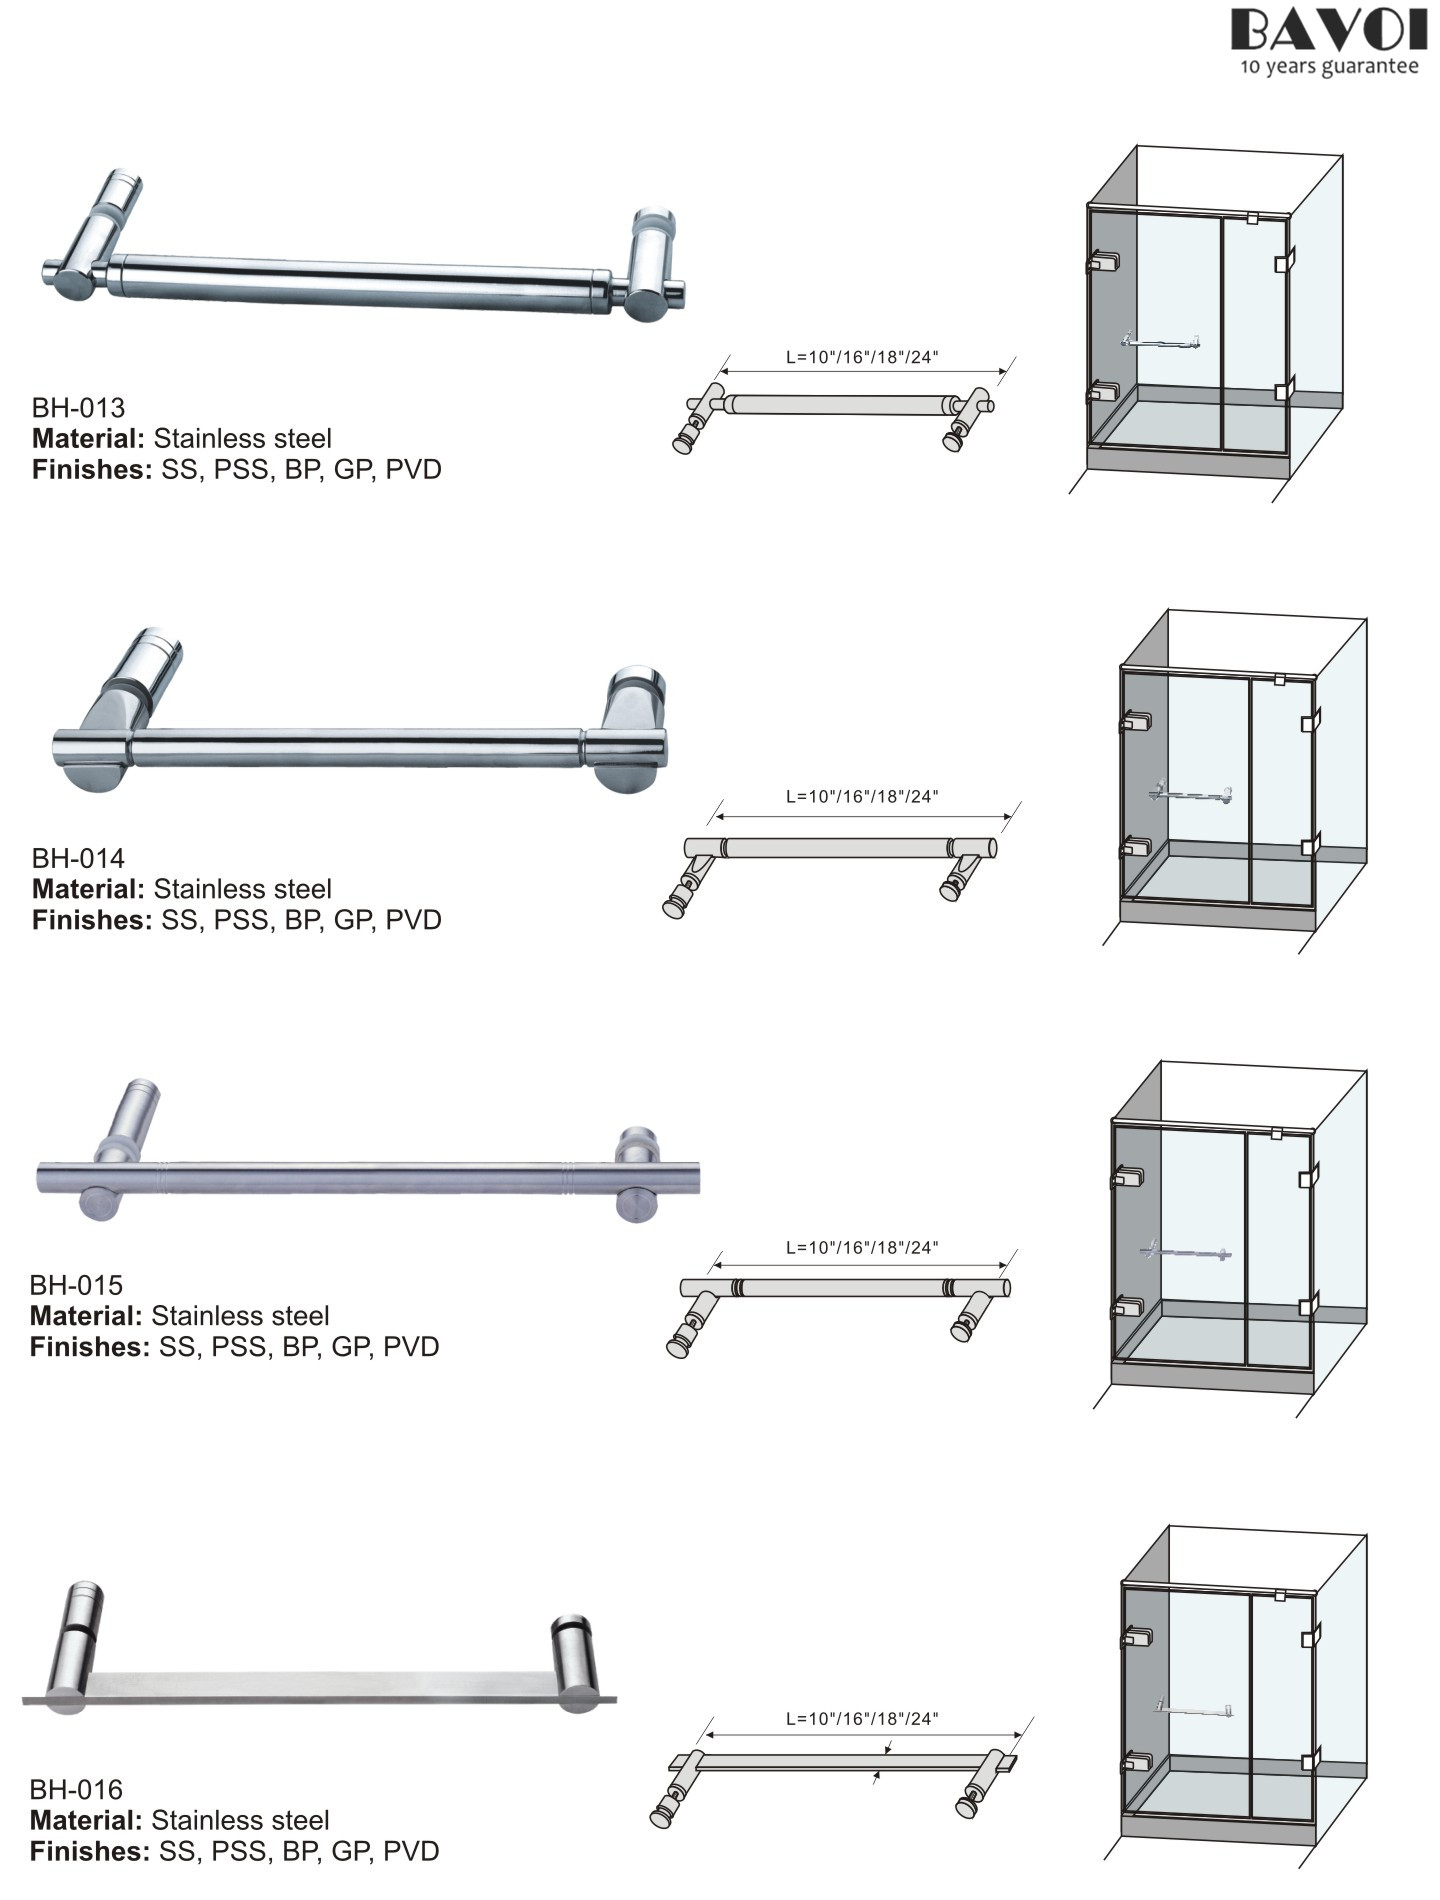 Bathroom Towel Bar Manufacturer For Glass Doorbh 013bh 014bh 015